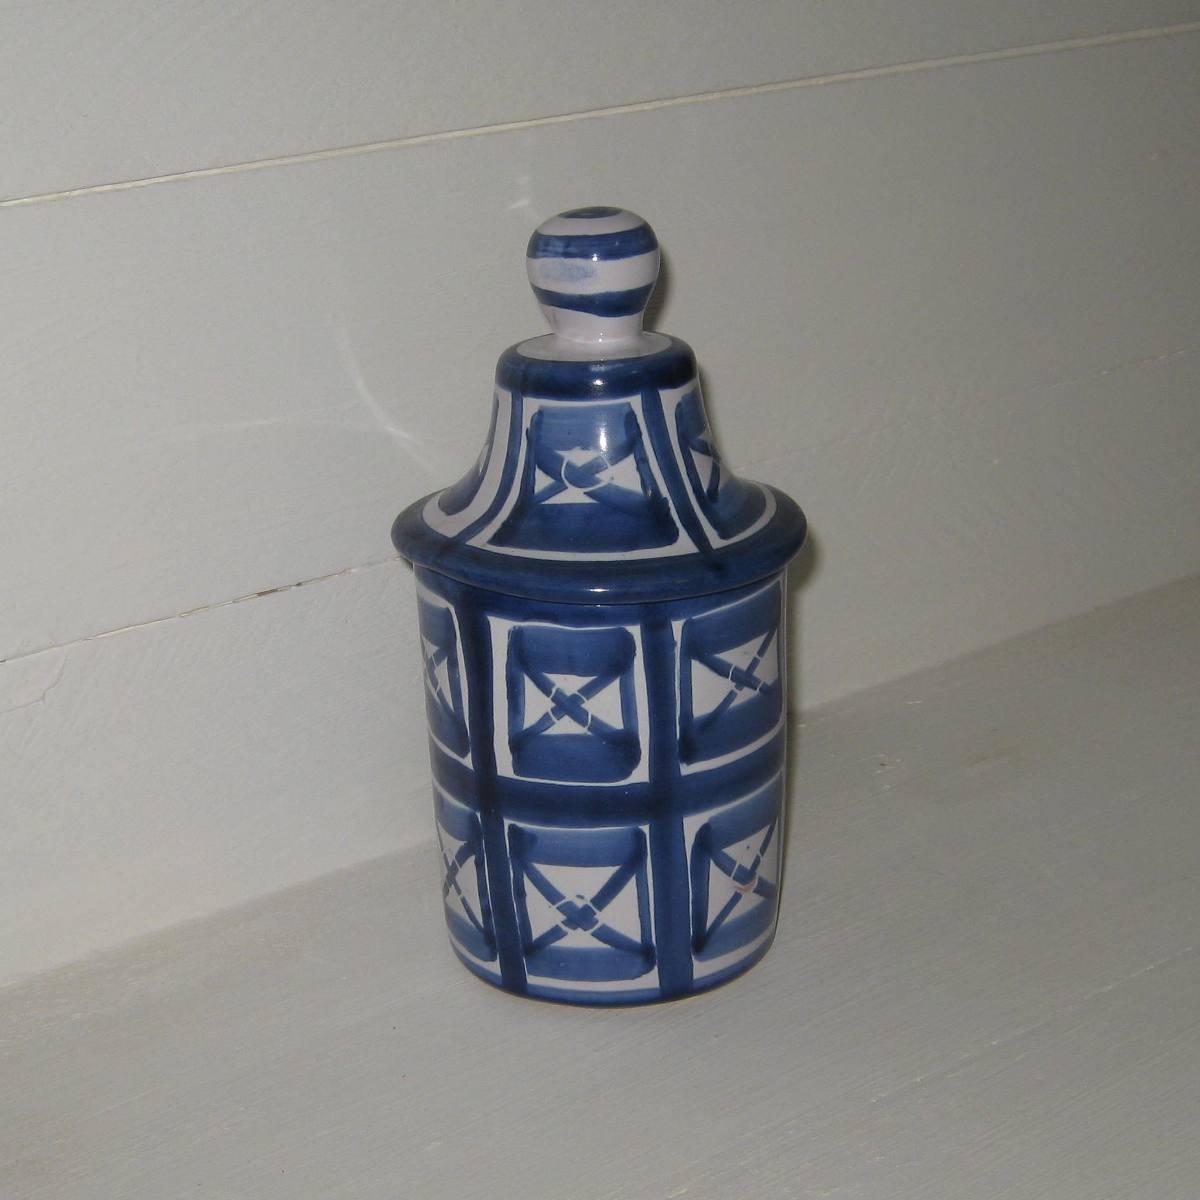 Pot robert picault bleu et blanc 1